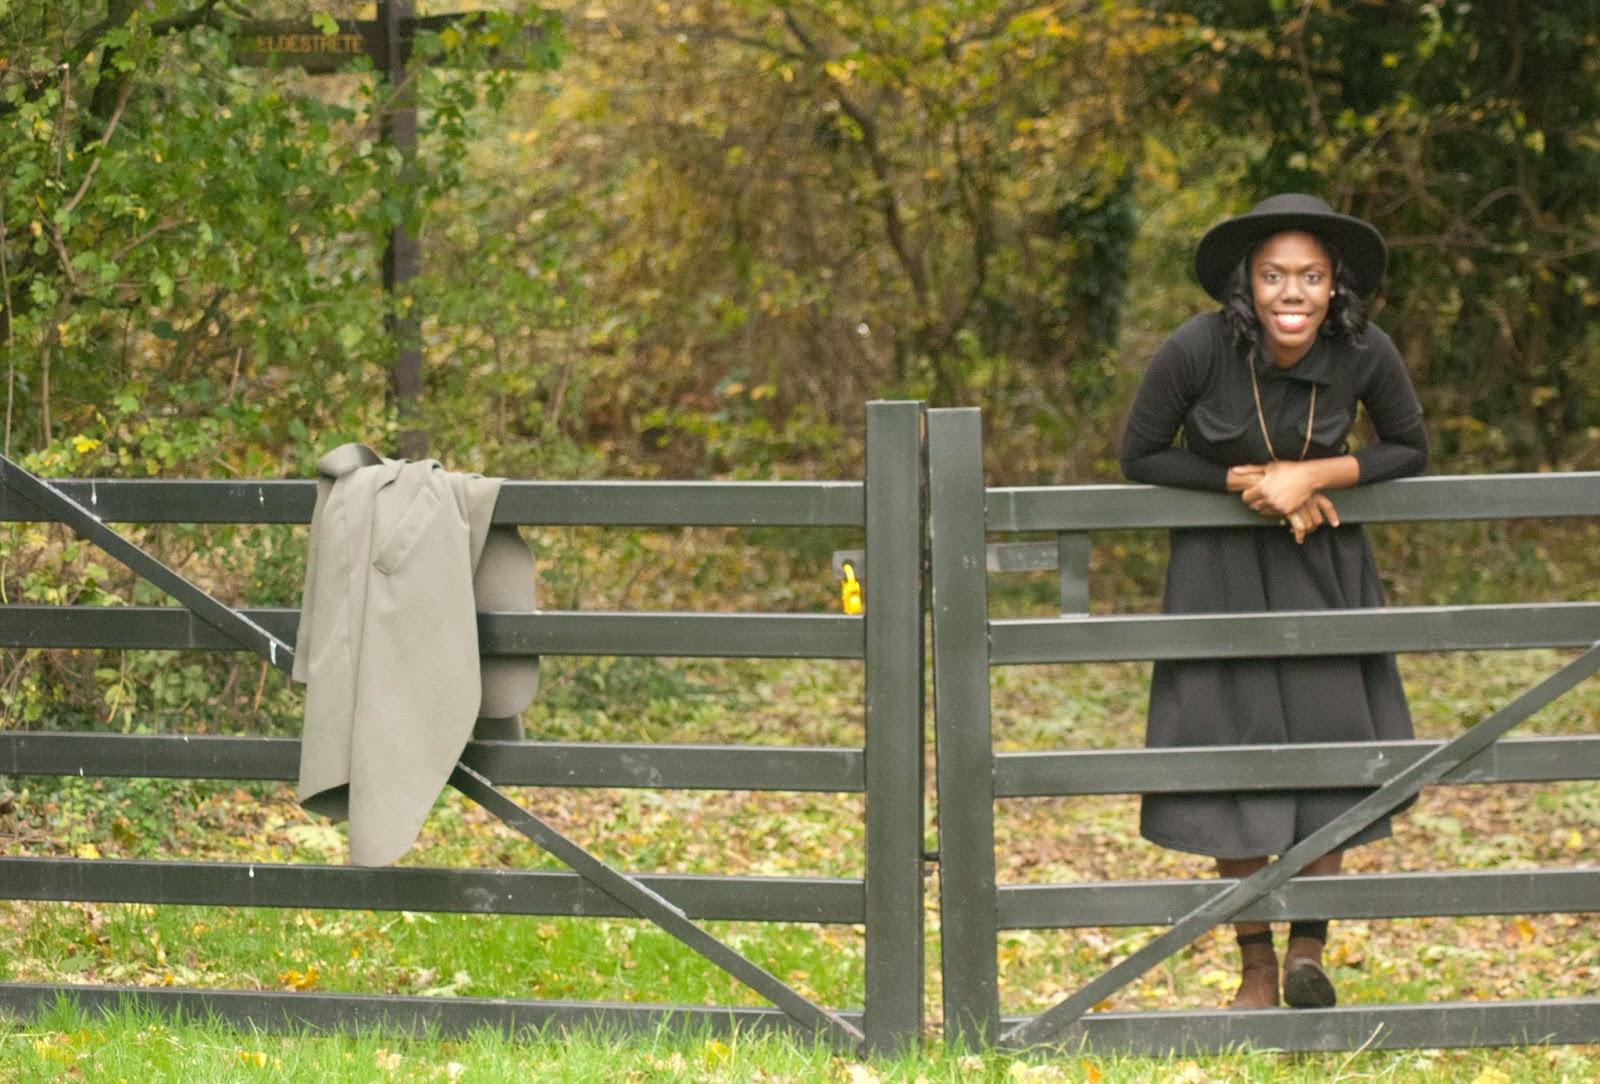 Boohoo duster coat, Boohoo black midi dress, fryent country park, fashion blogger, 100 Ways to 30, Style & Fashion